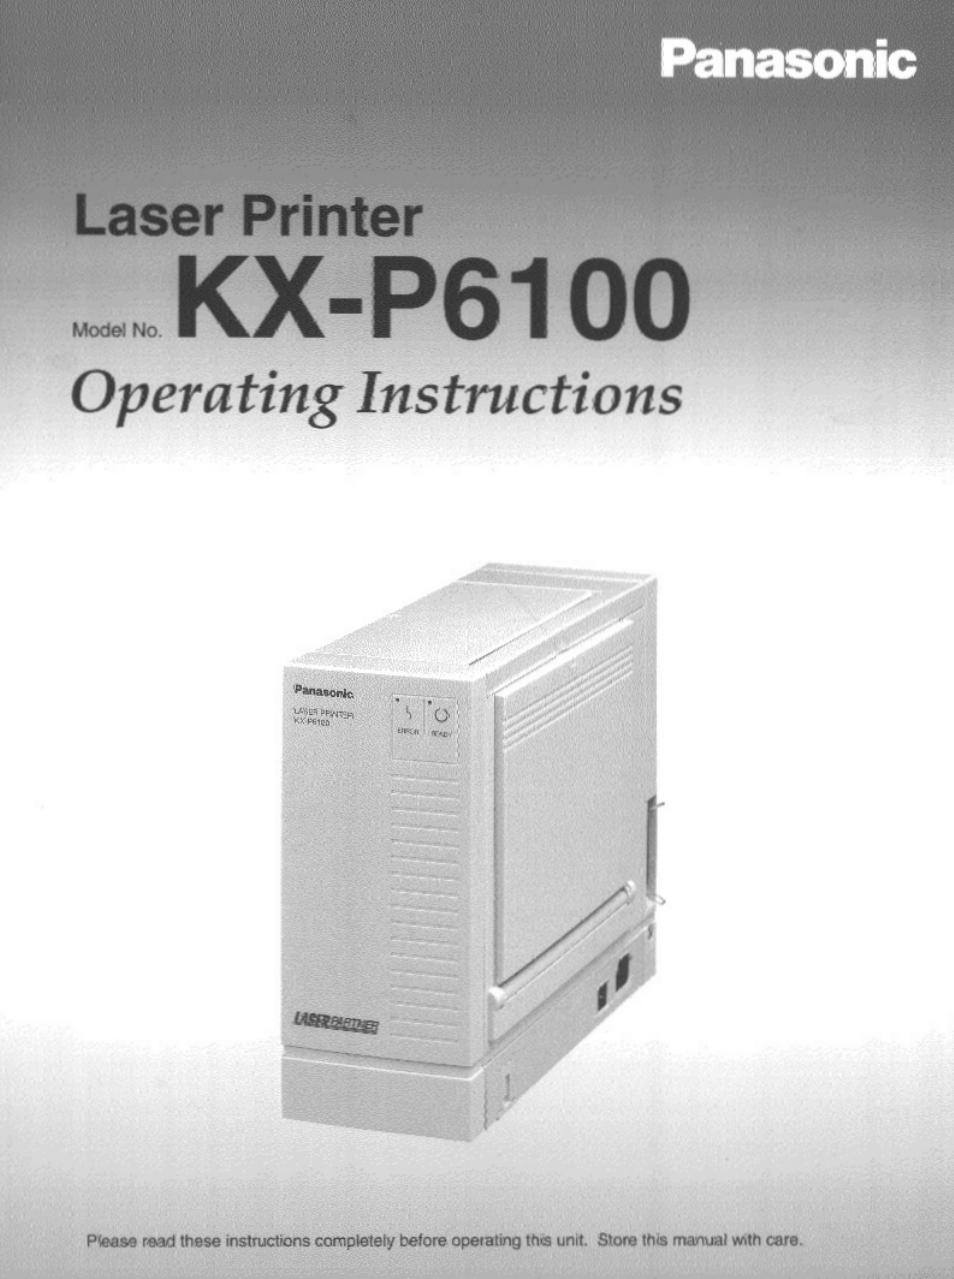 panasonic kx p6100 user manual 44 pages rh manualsdir com Panasonic Technical Support Panasonic Cordless Phones